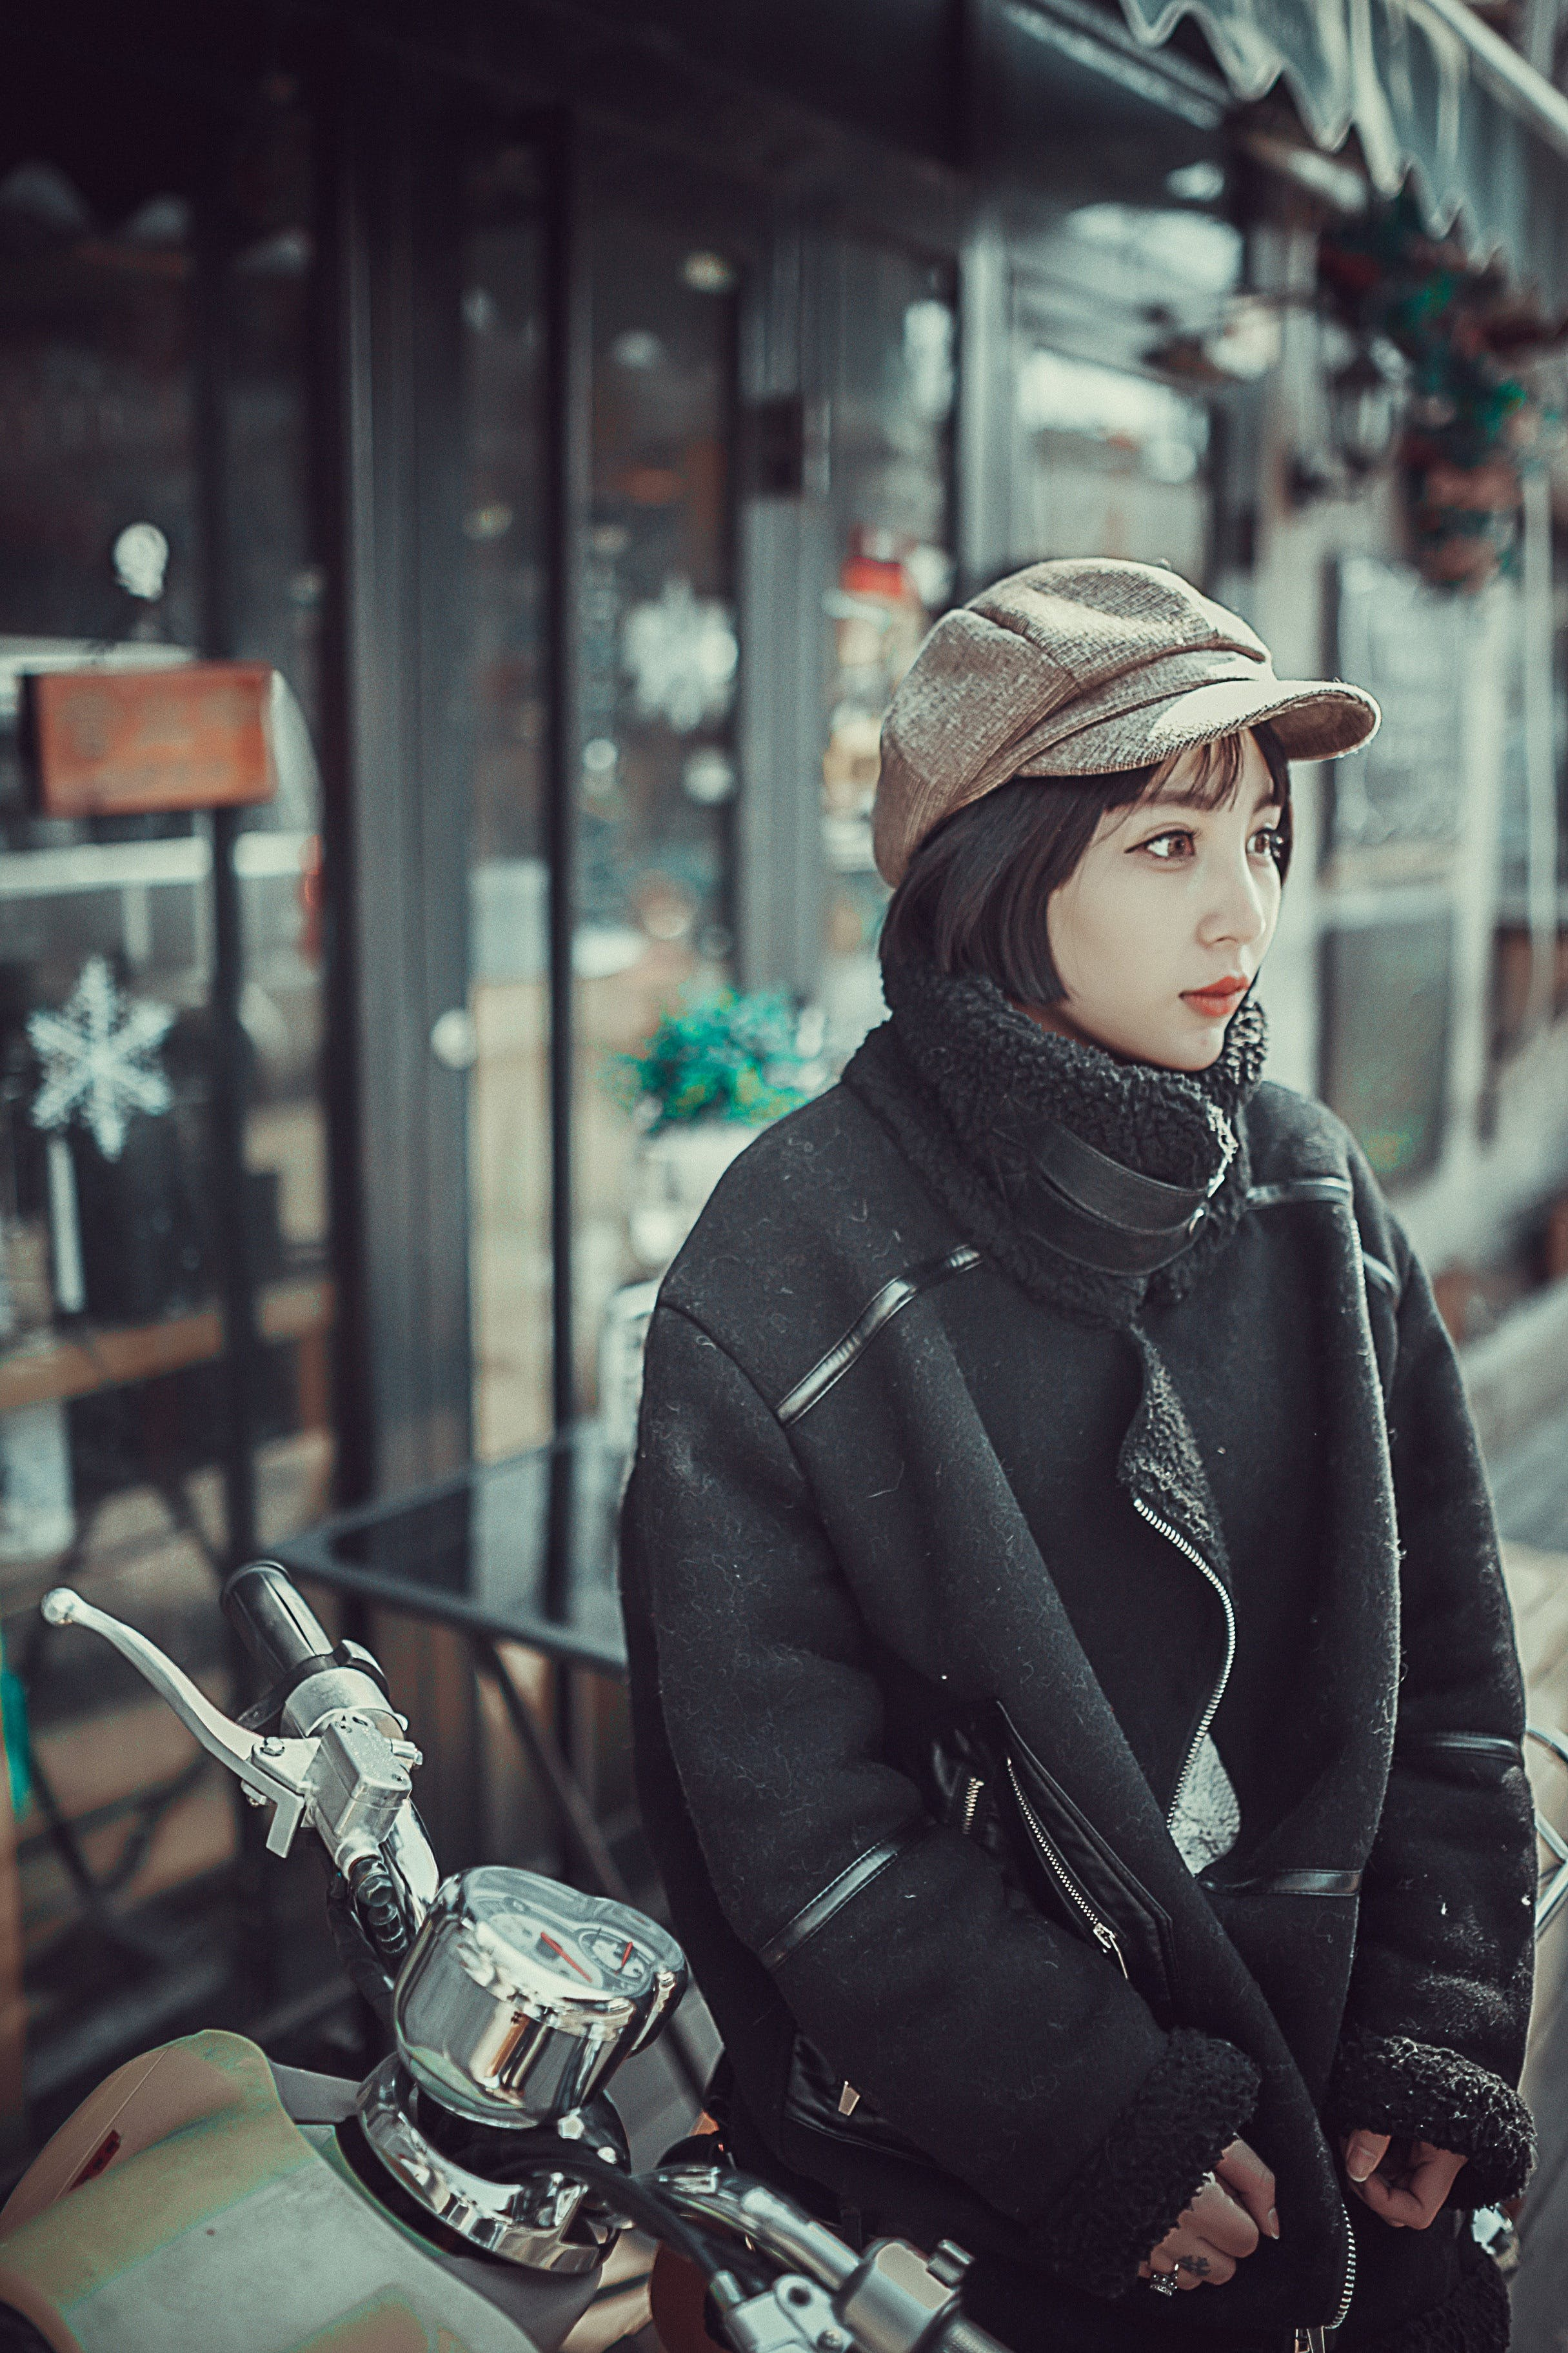 Kostenloses Stock Foto zu kalt, stadt, fashion, person